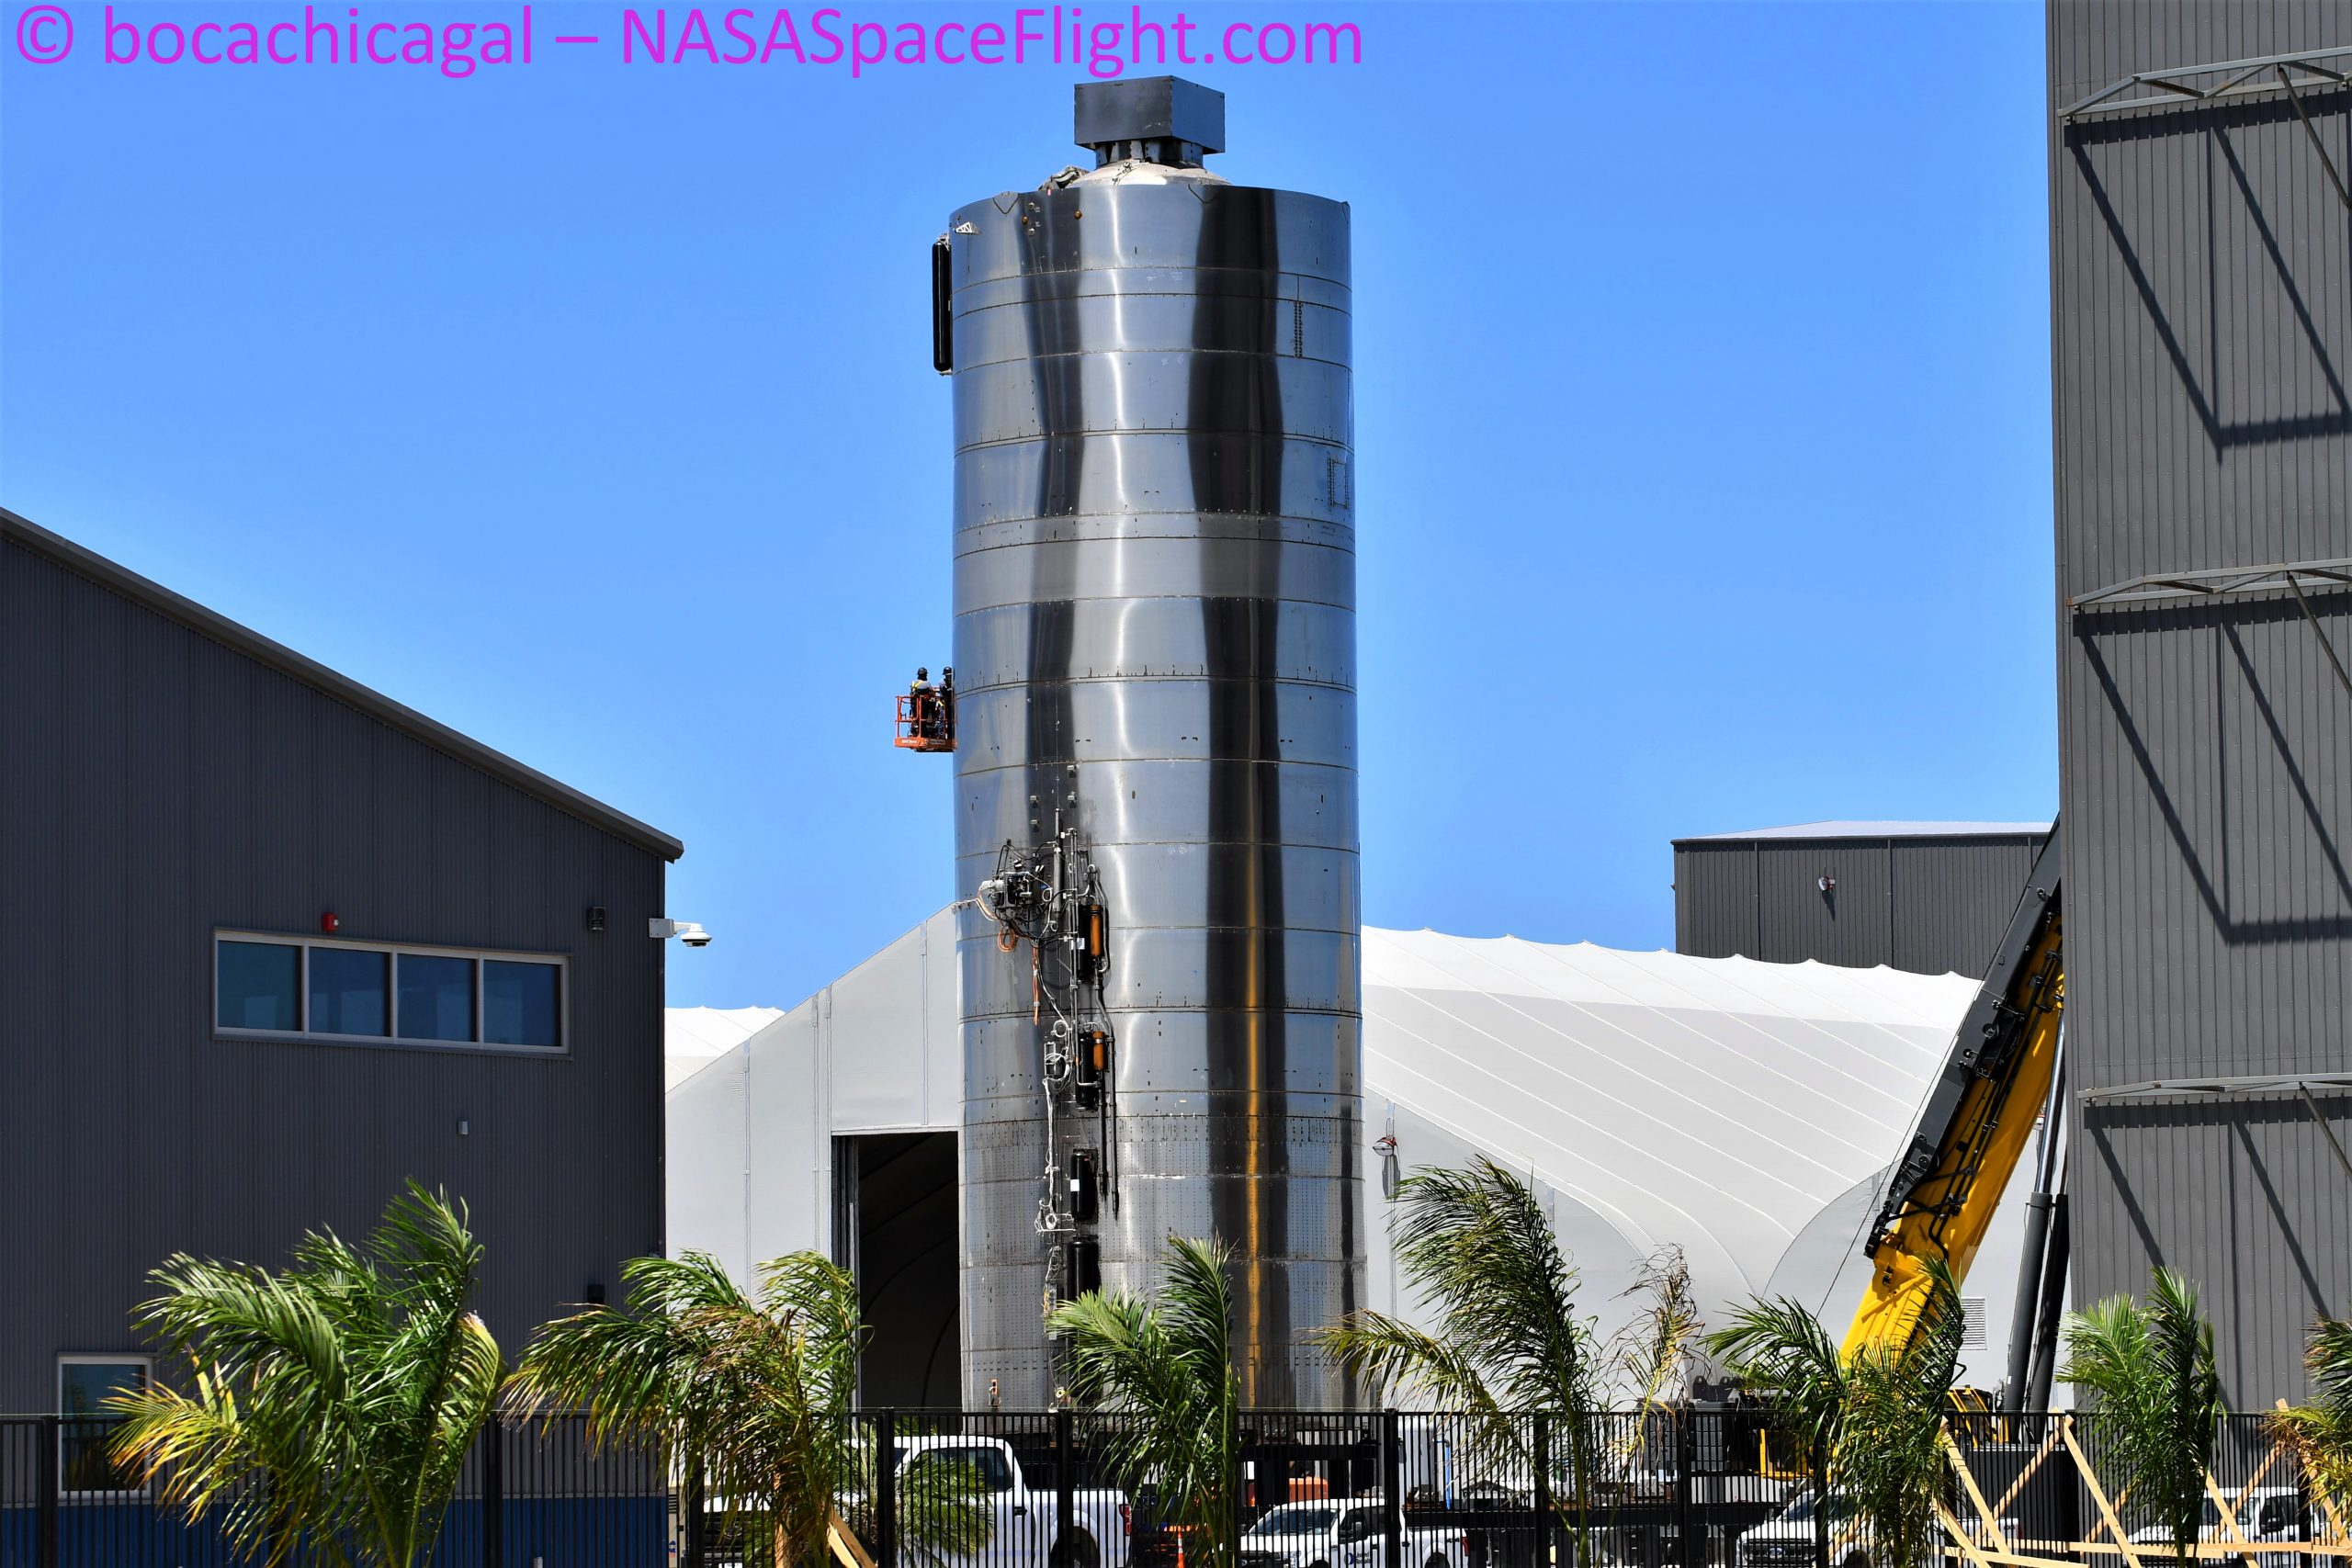 Starship Boca Chica 082920 (NASASpaceflight – bocachicagal) SN5 1